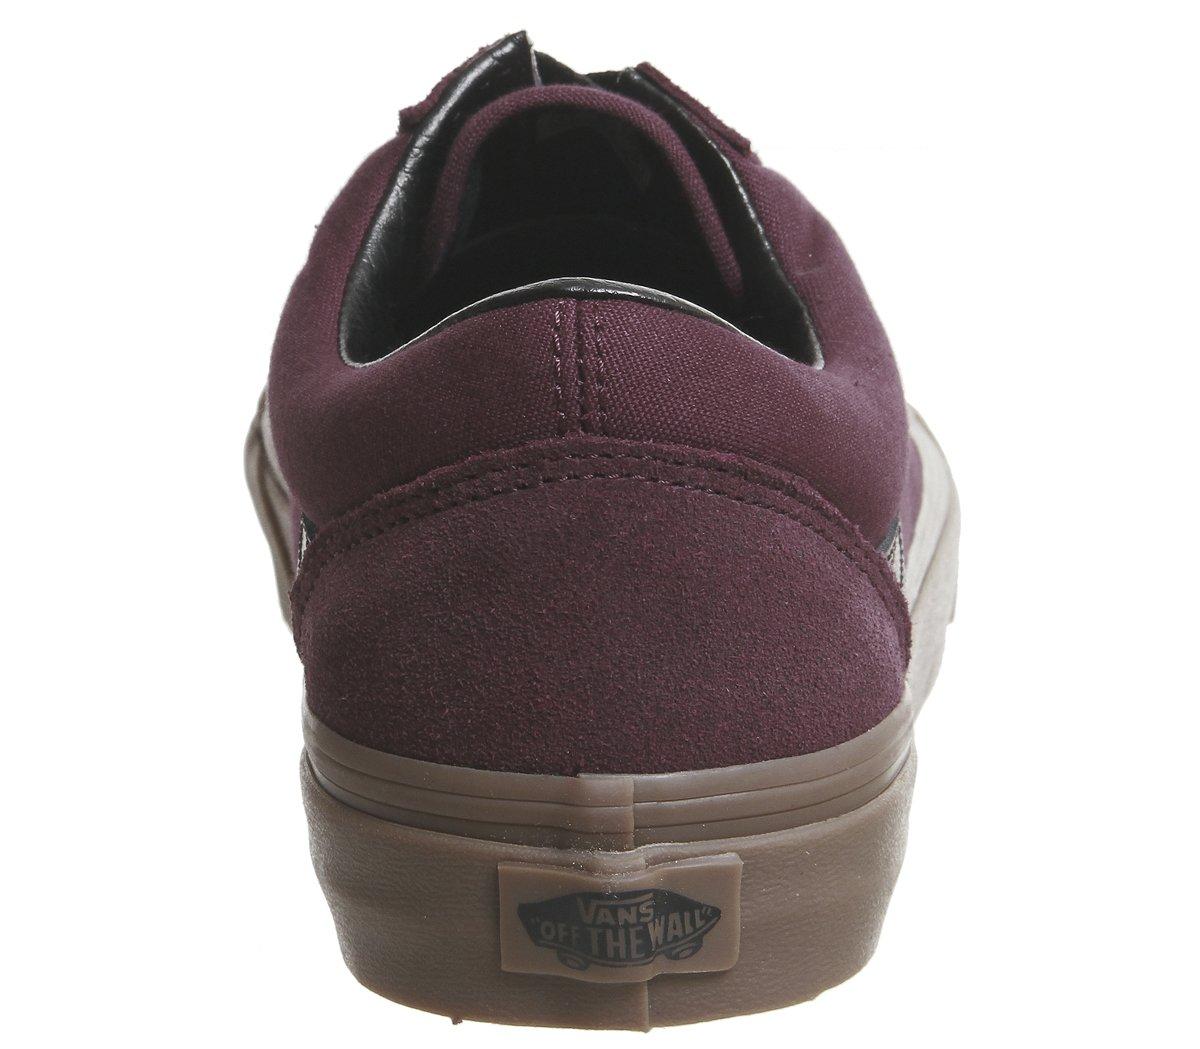 Vans B078Y927PT Unisex Old Skool Classic Skate Shoes B078Y927PT Vans 12 D(M) US|Catawba Grape 81a9fd